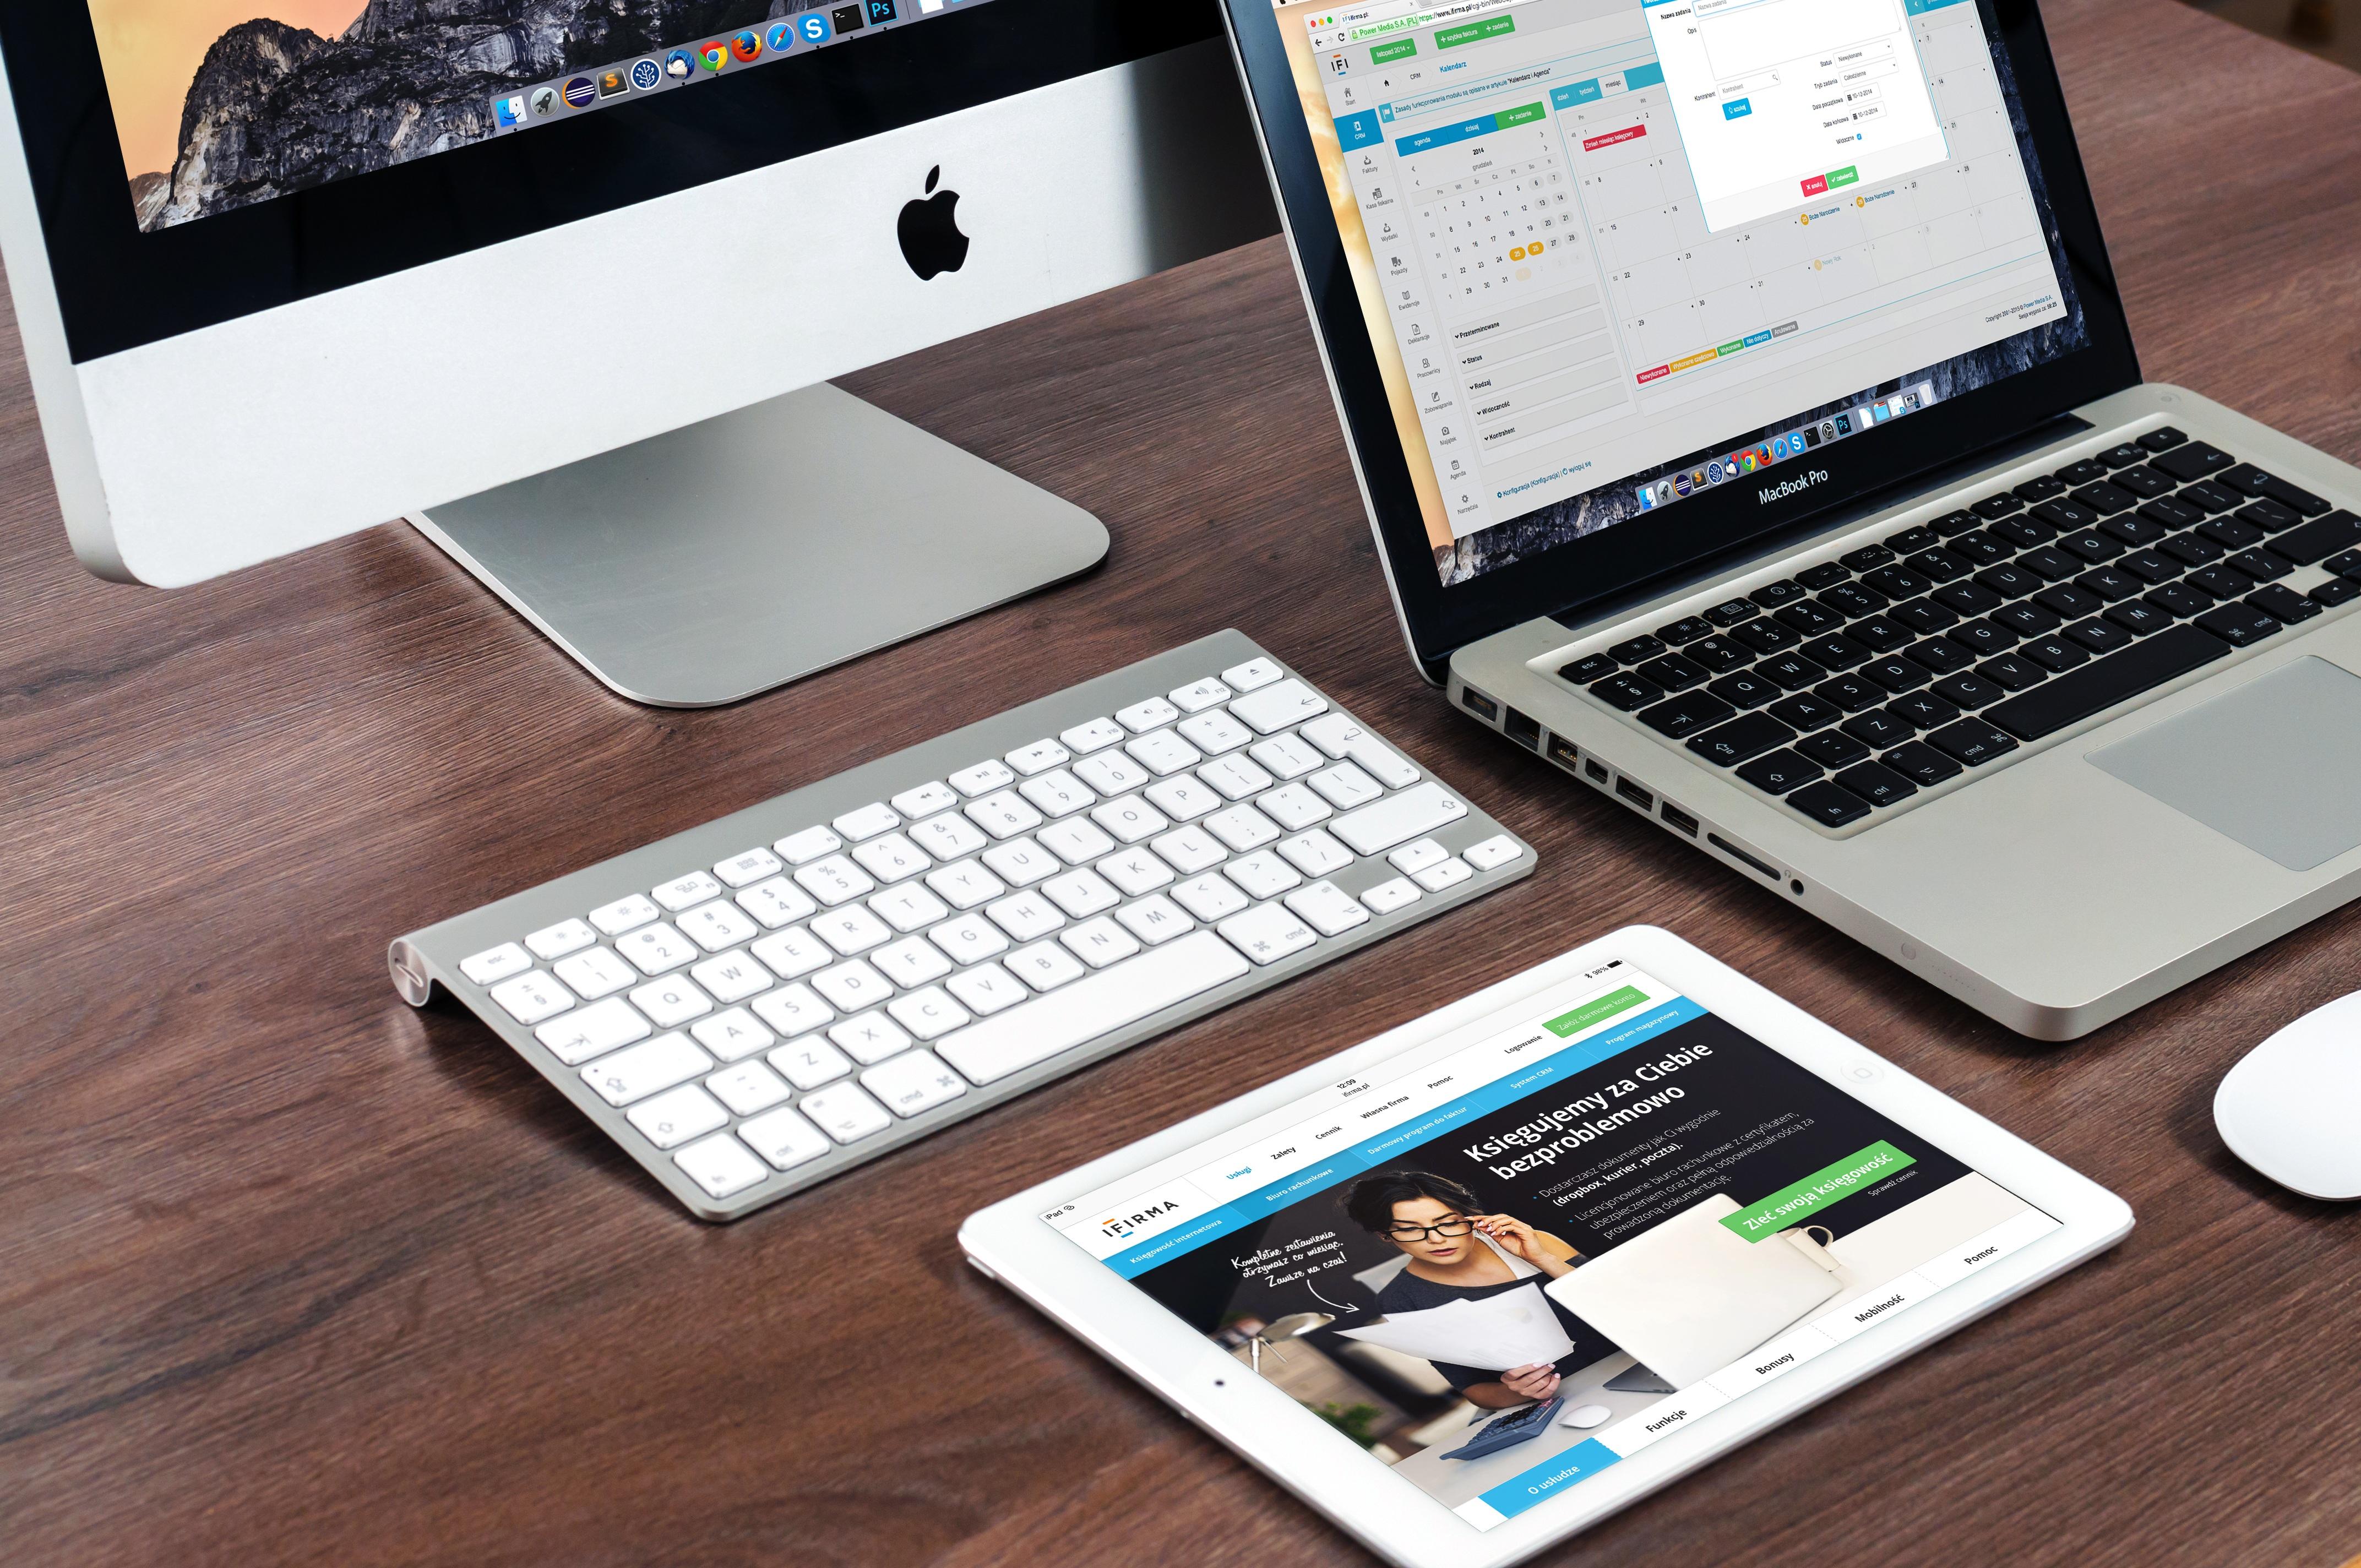 macbook-apple-imac-computer-39284.jpeg